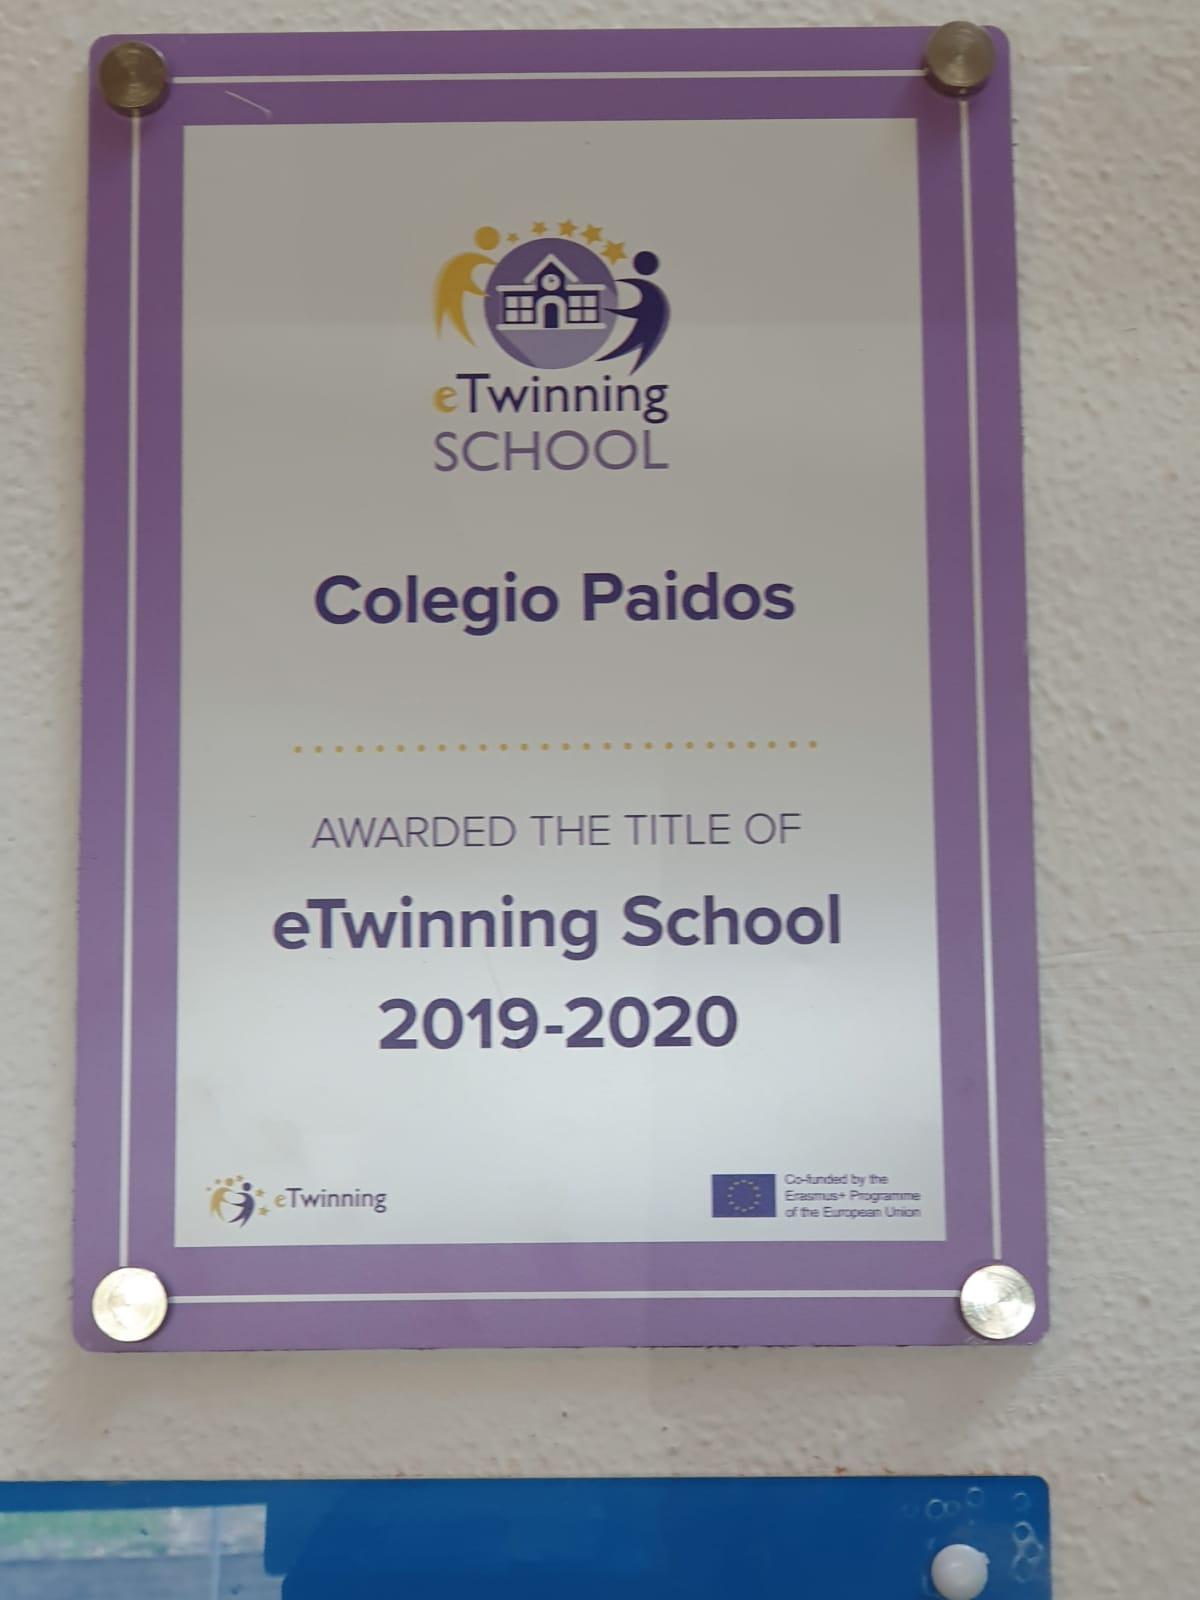 Paidos proyecto europeo eTwinning premio